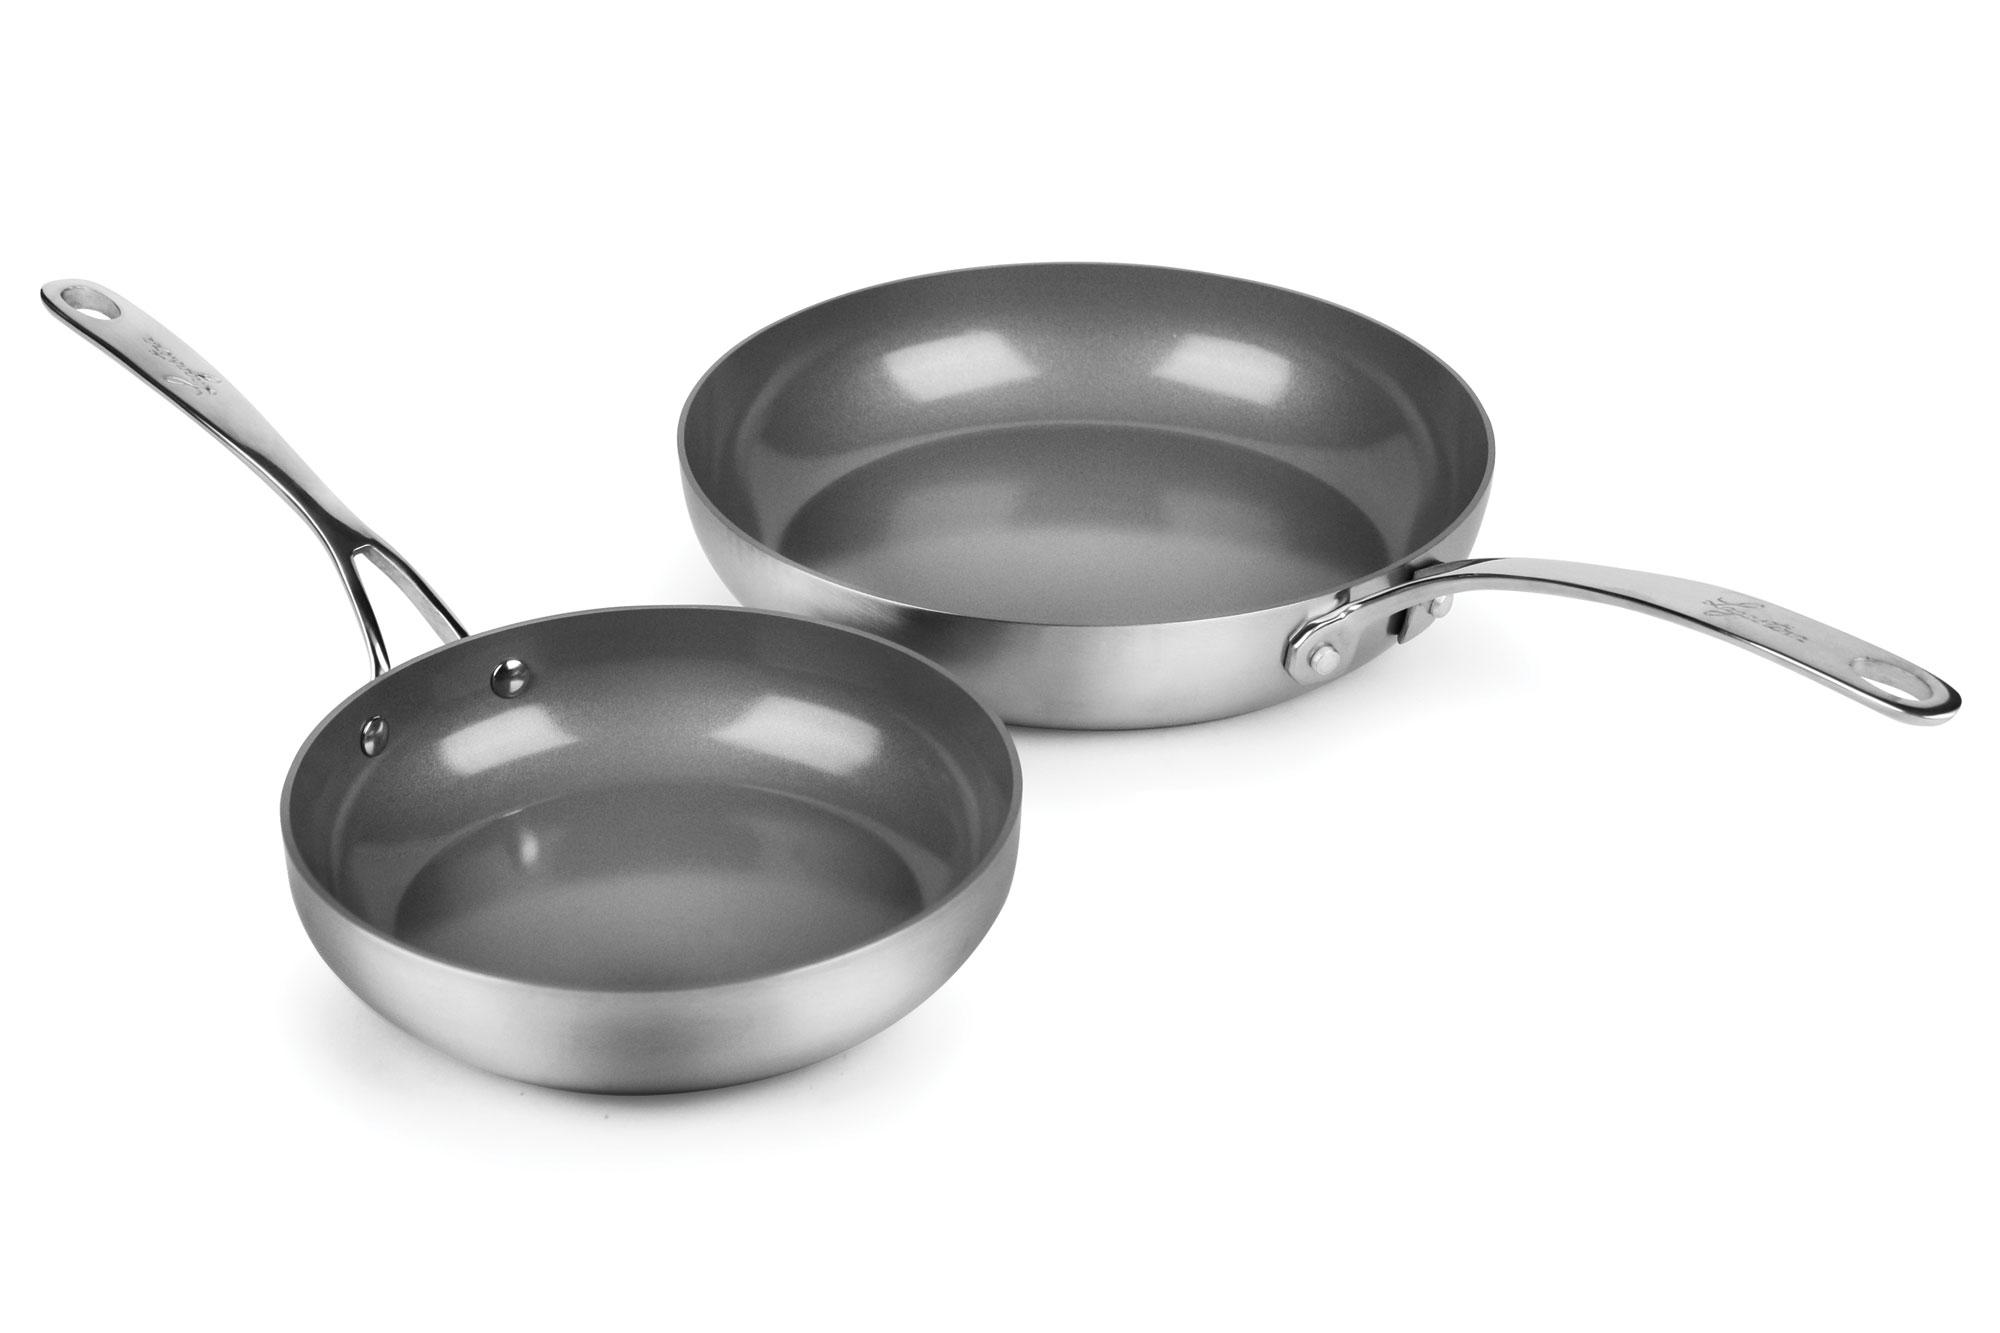 Lagostina Axia Tri Ply Stainless Steel Ceramic Nonstick 8